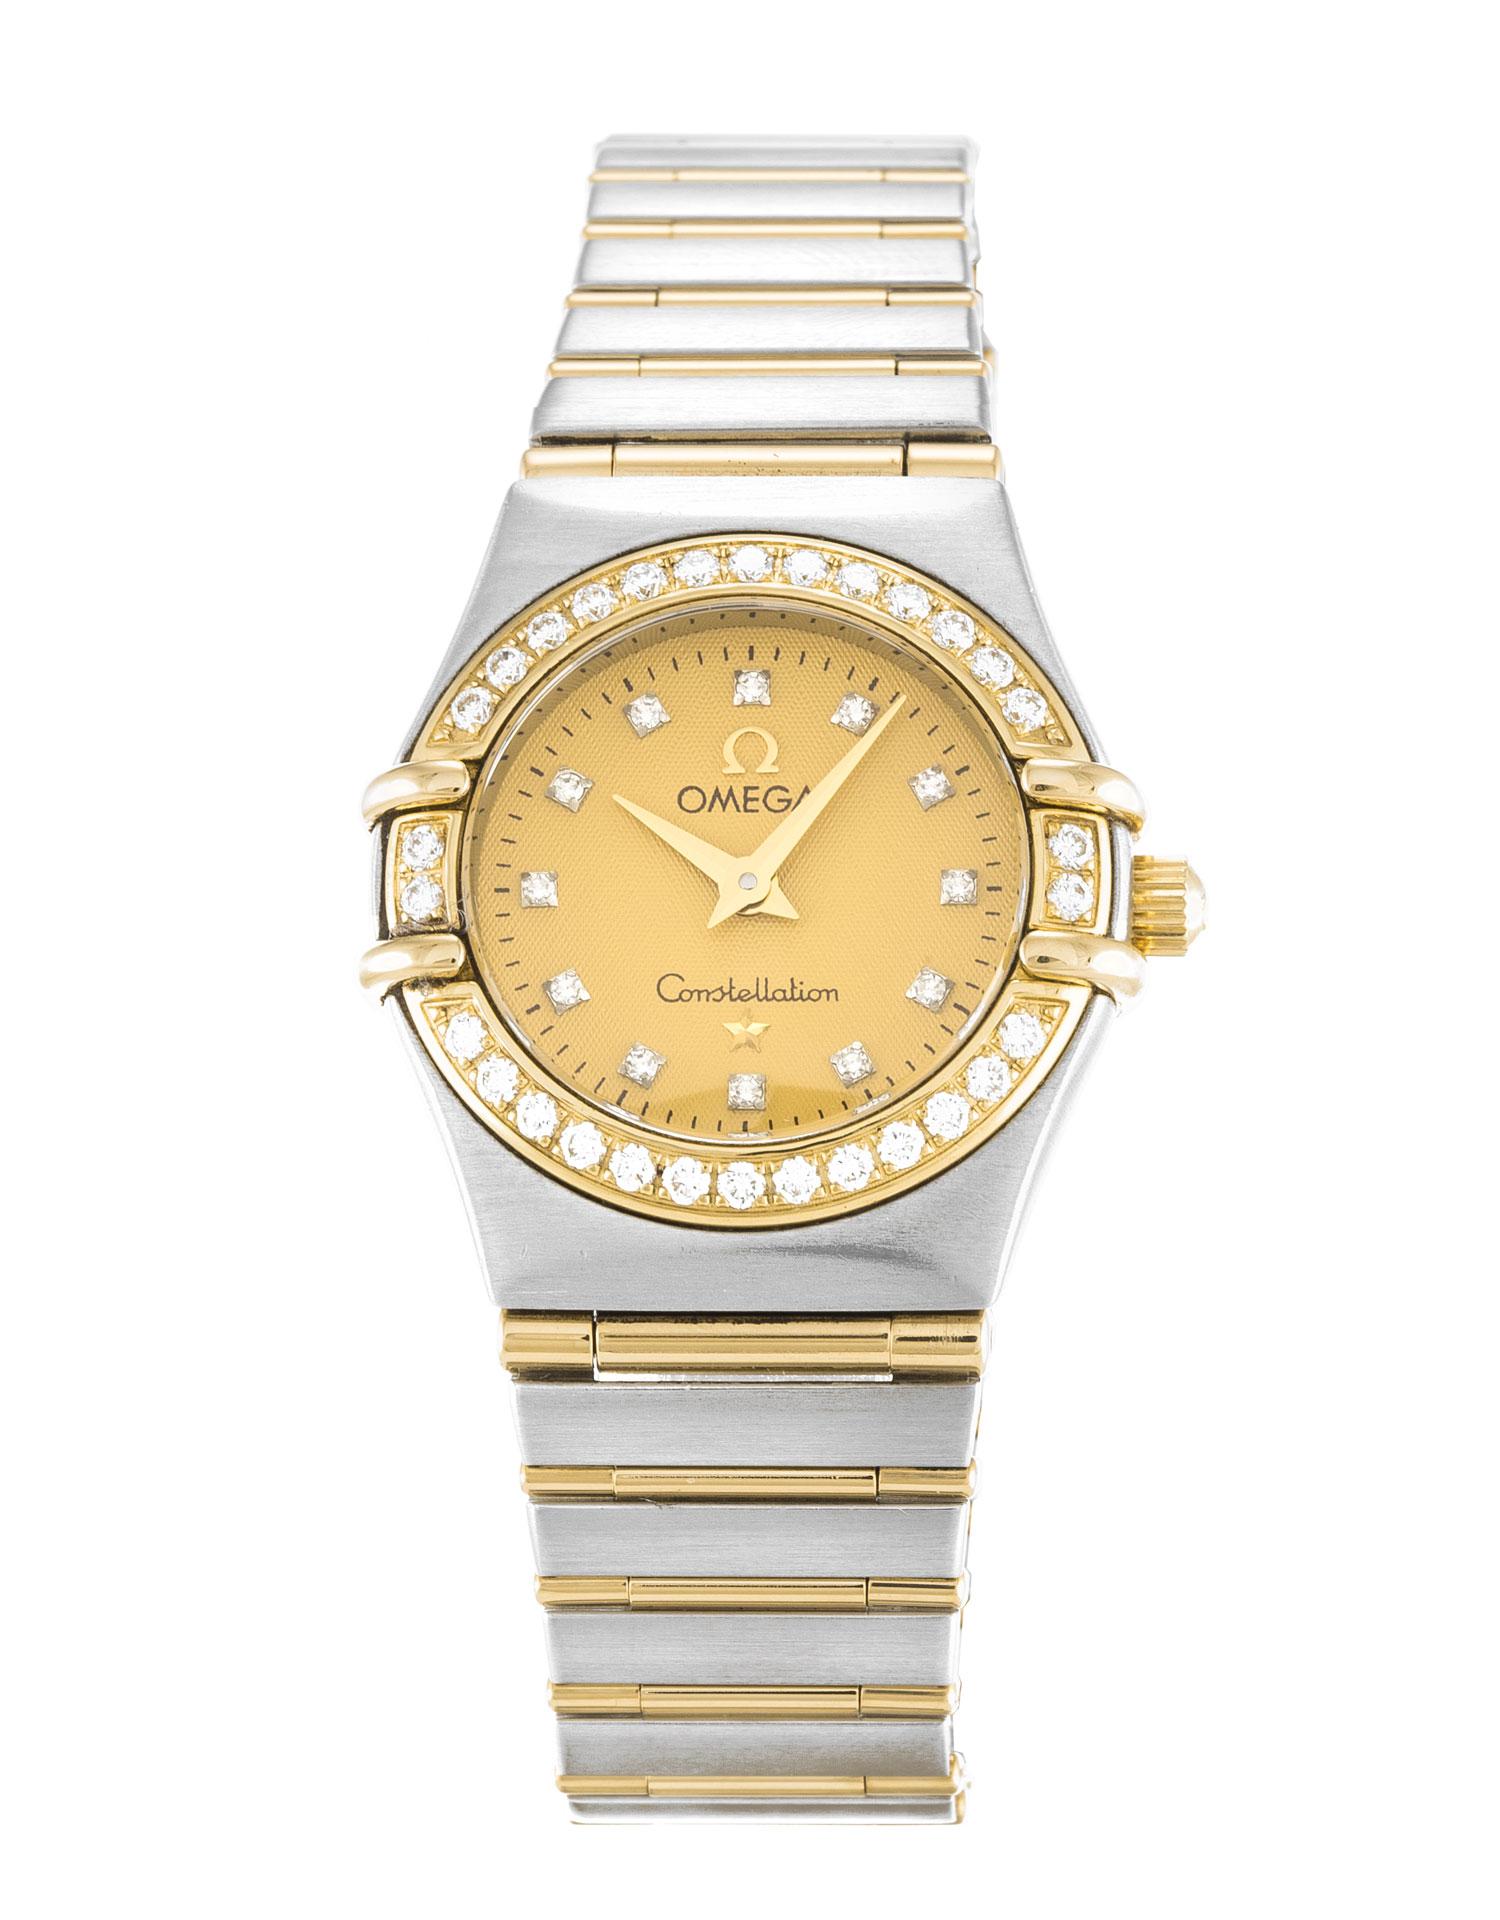 Omega Constellation Mini 1267.15.00 Ladies 22.5 Mm Steel & Yellow Gold Set With Diamonds Case Quartz Movement – iapac.to